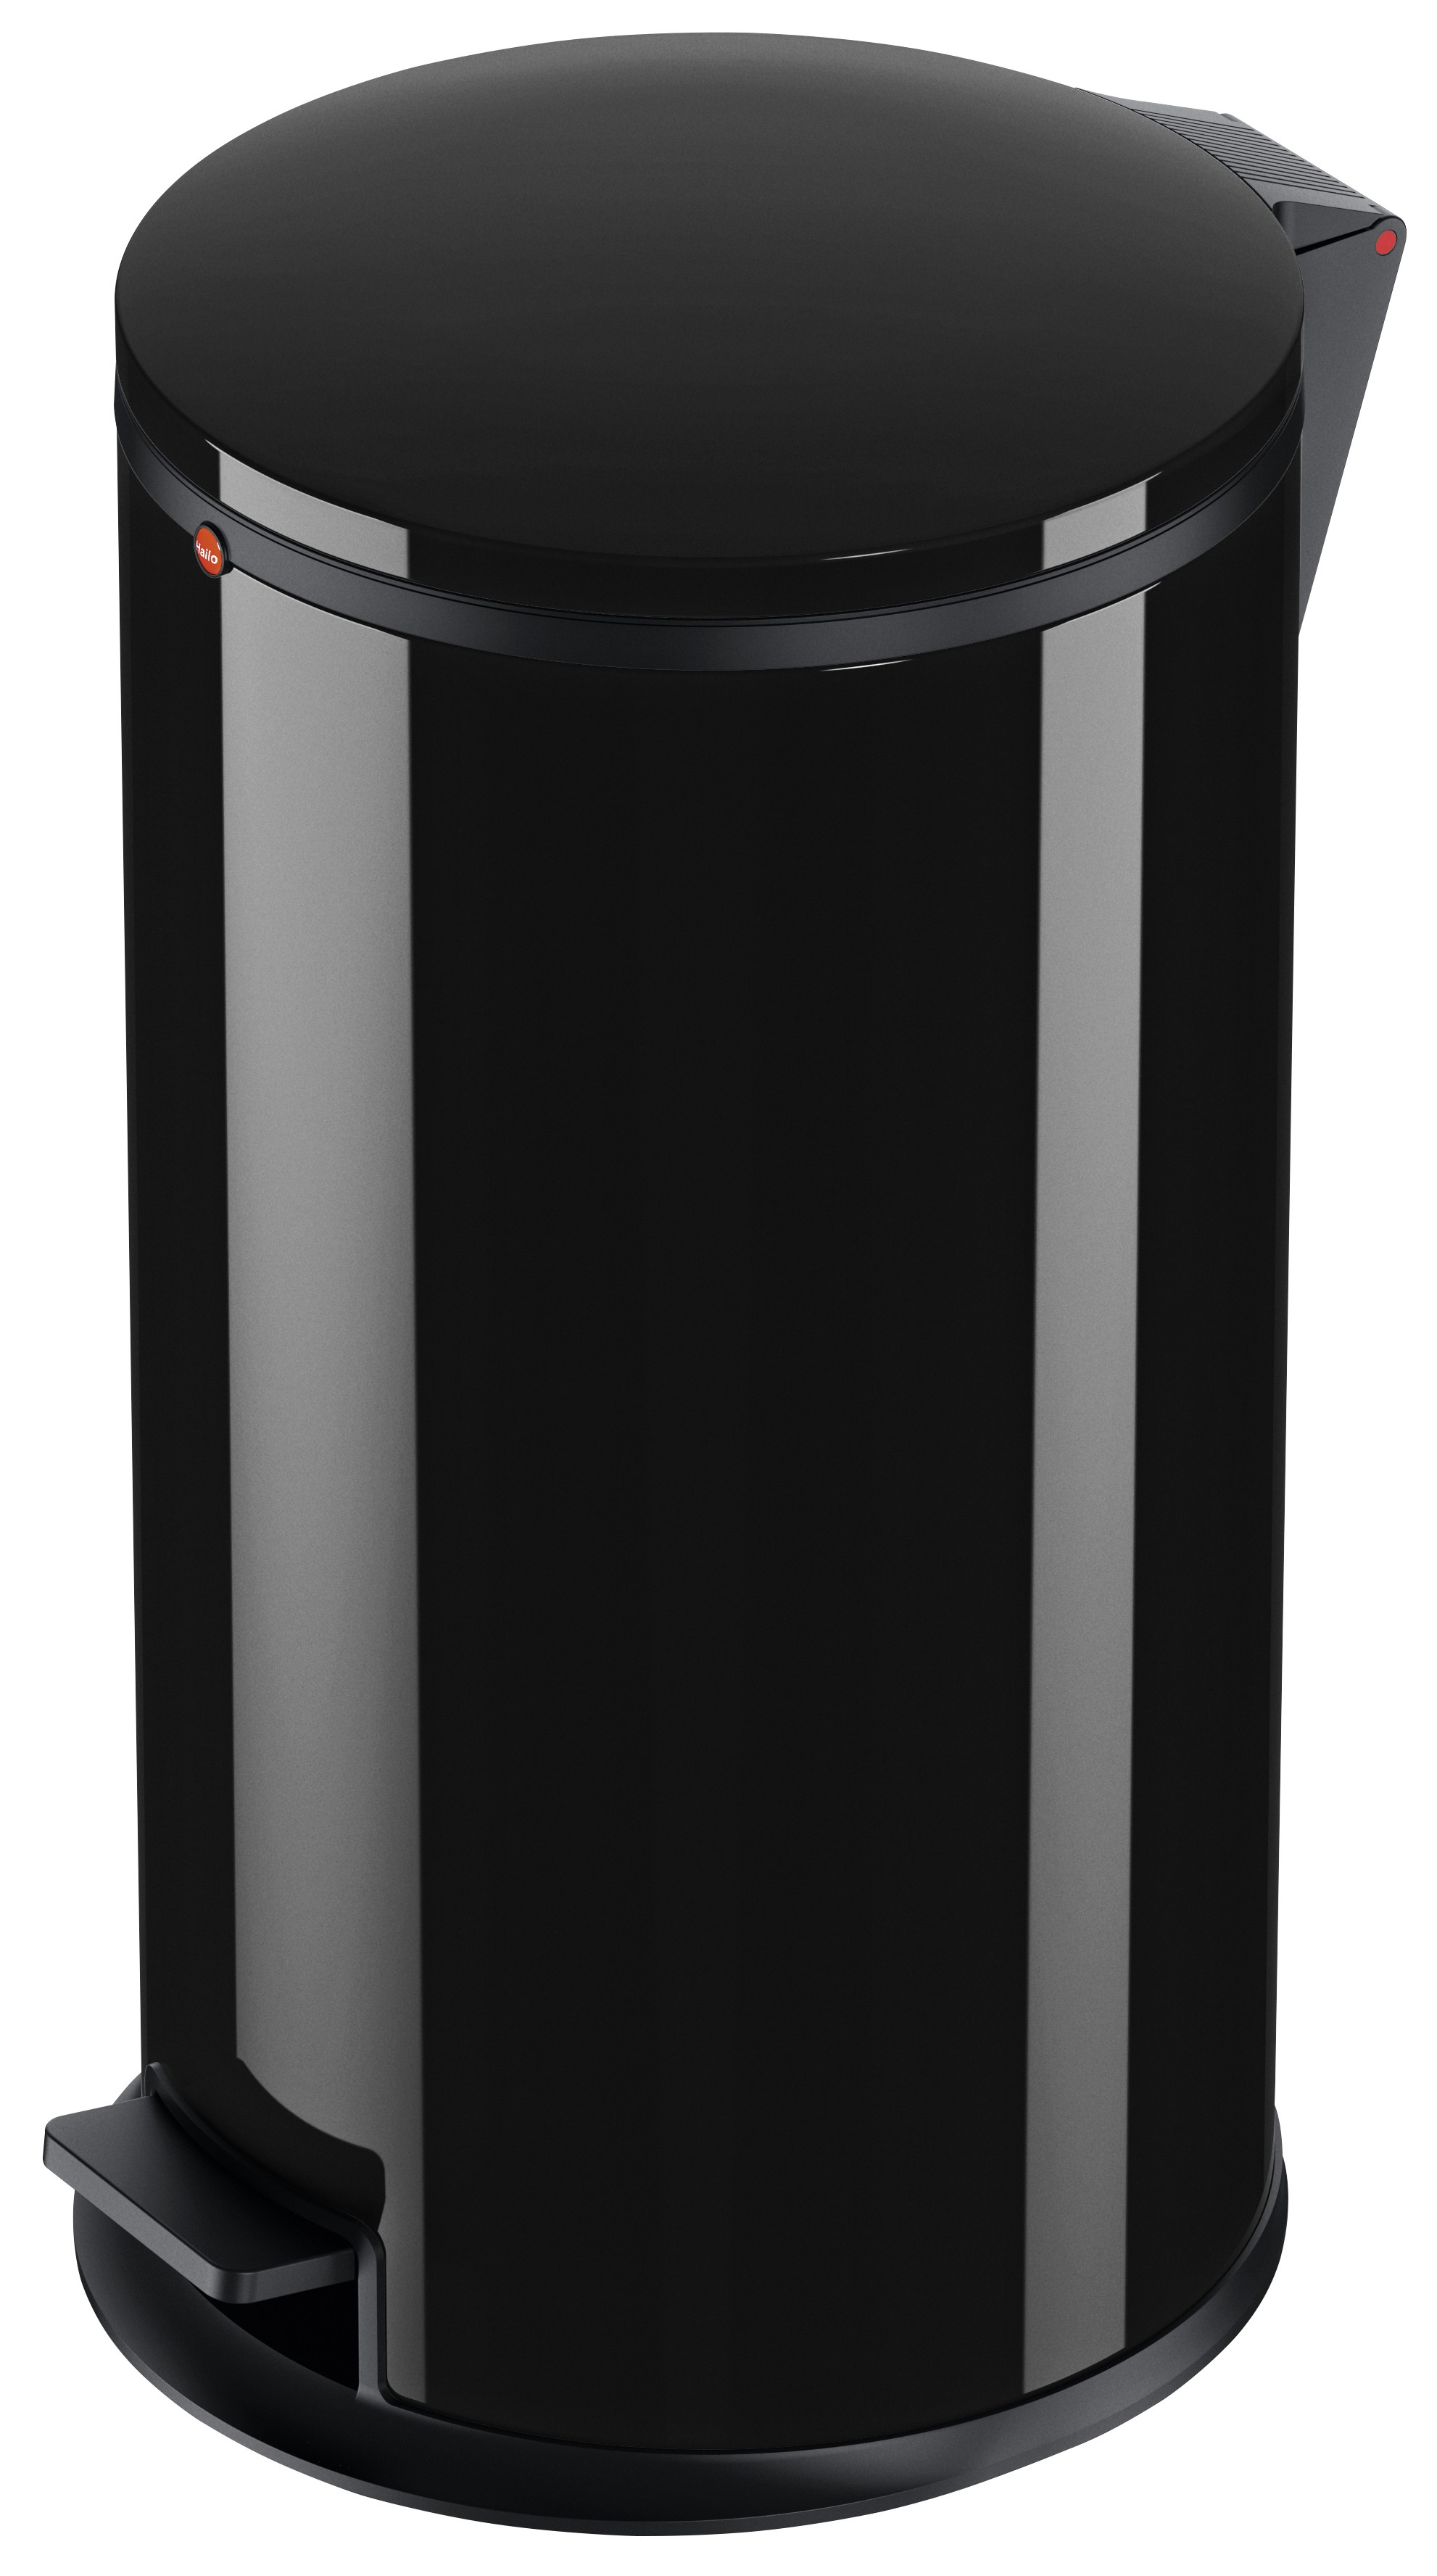 Hailo Pure L, Stahlblech schwarz, 25 Liter, Inneneimer: verzinkt, Tret-Abfallsammler